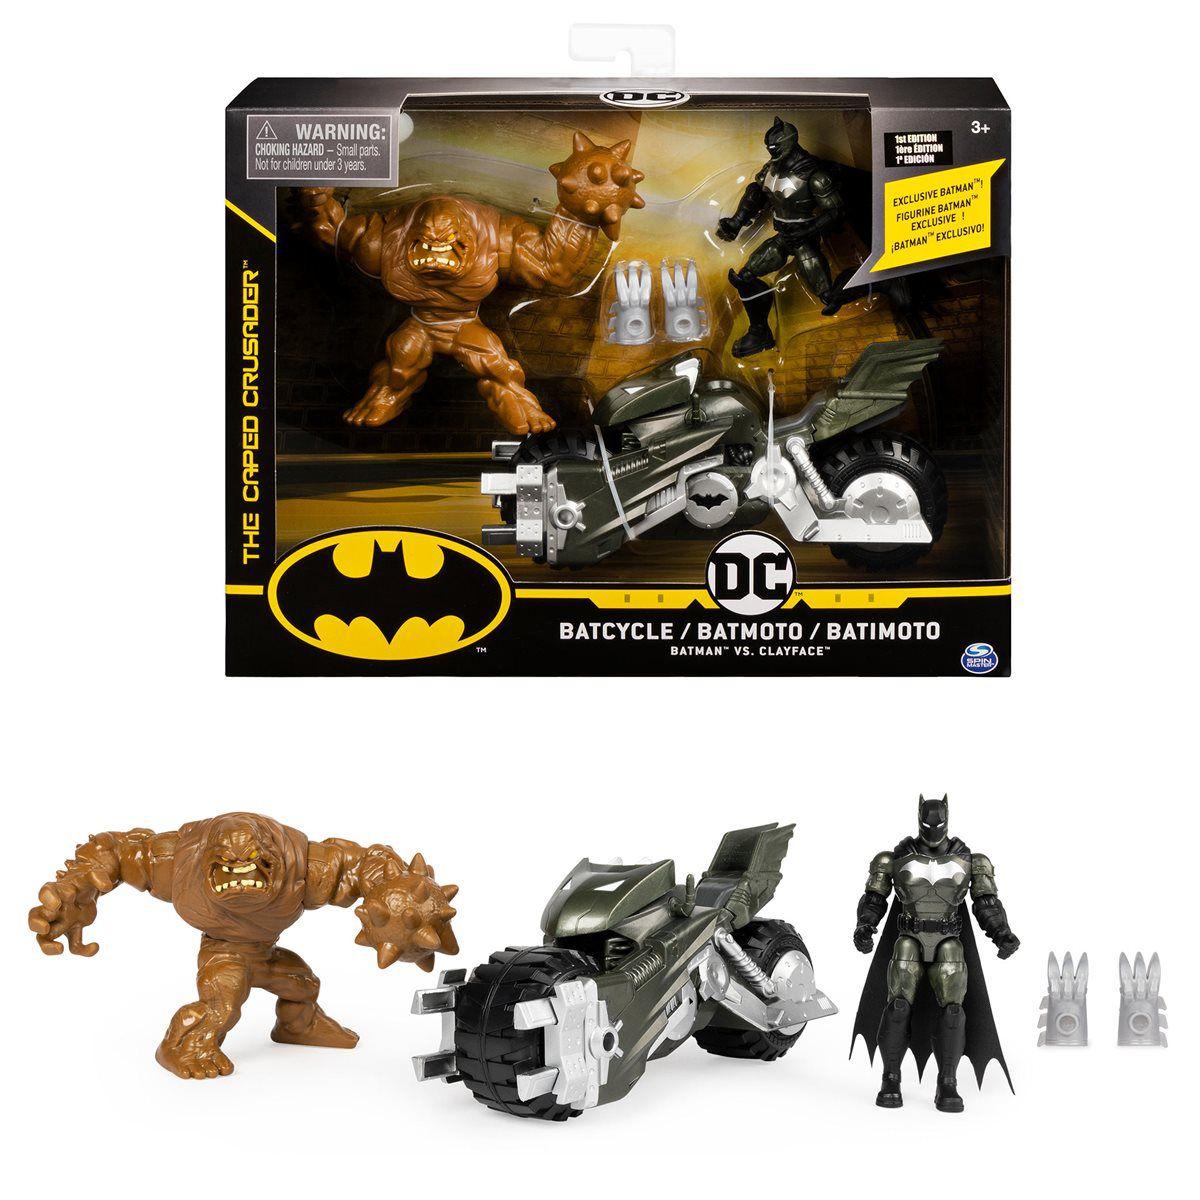 Boneco Batman Dc - Batimoto - Batman VS Clayface - Spin Master